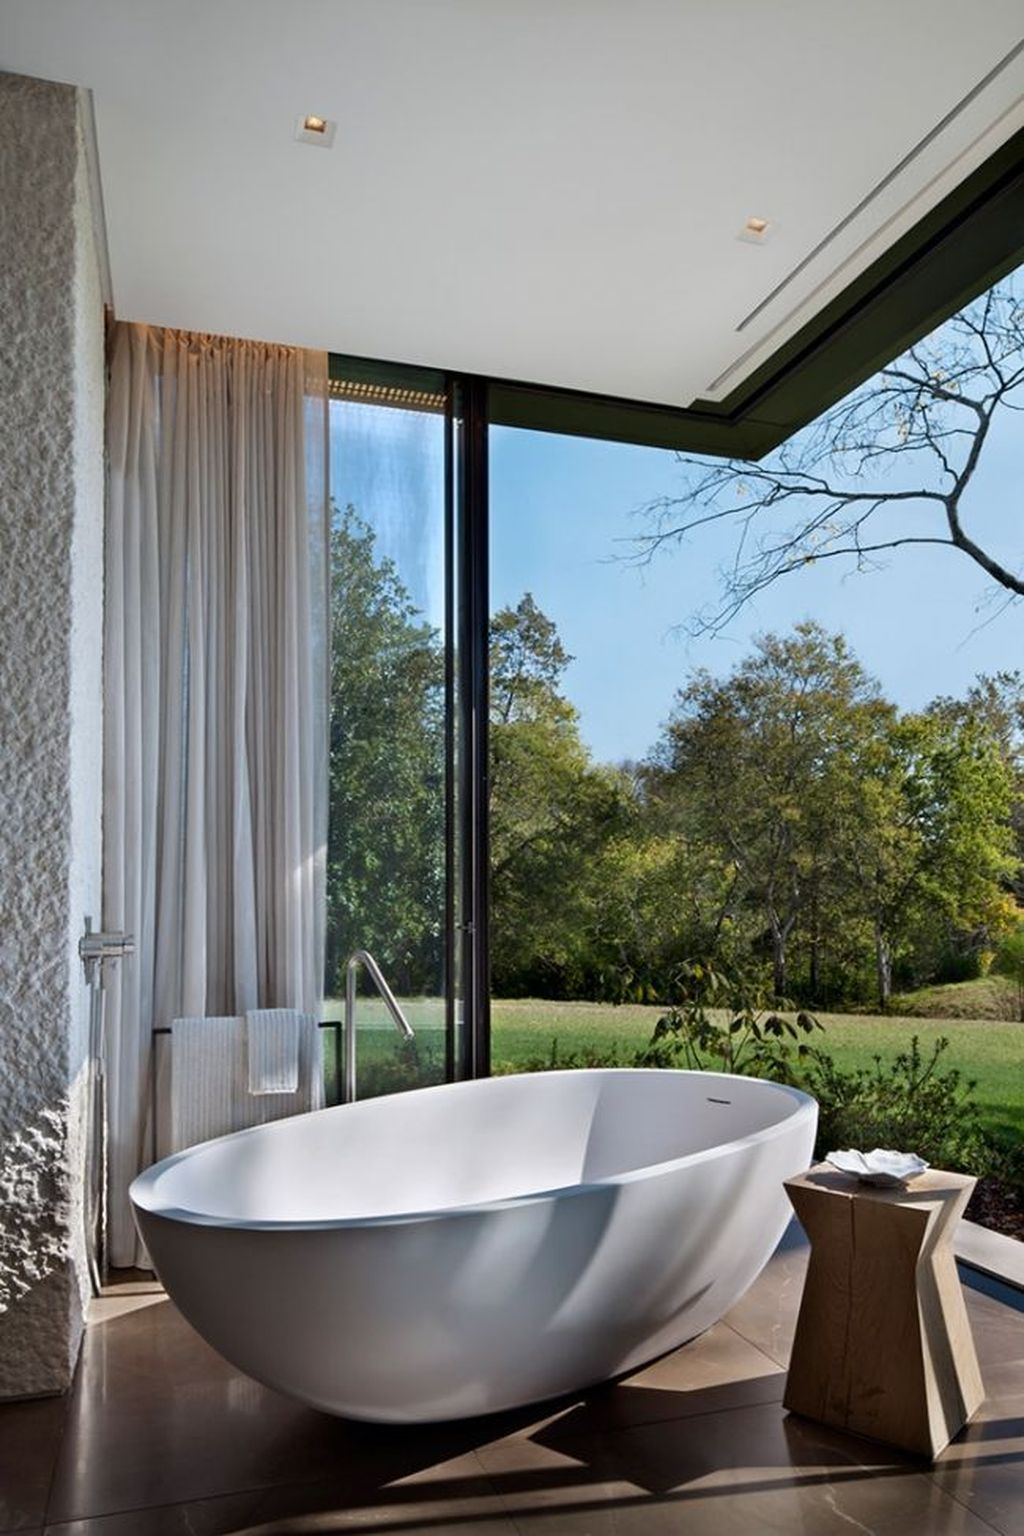 Creative Outdoor Bathroom Design Ideas For Enjoying Summer 16